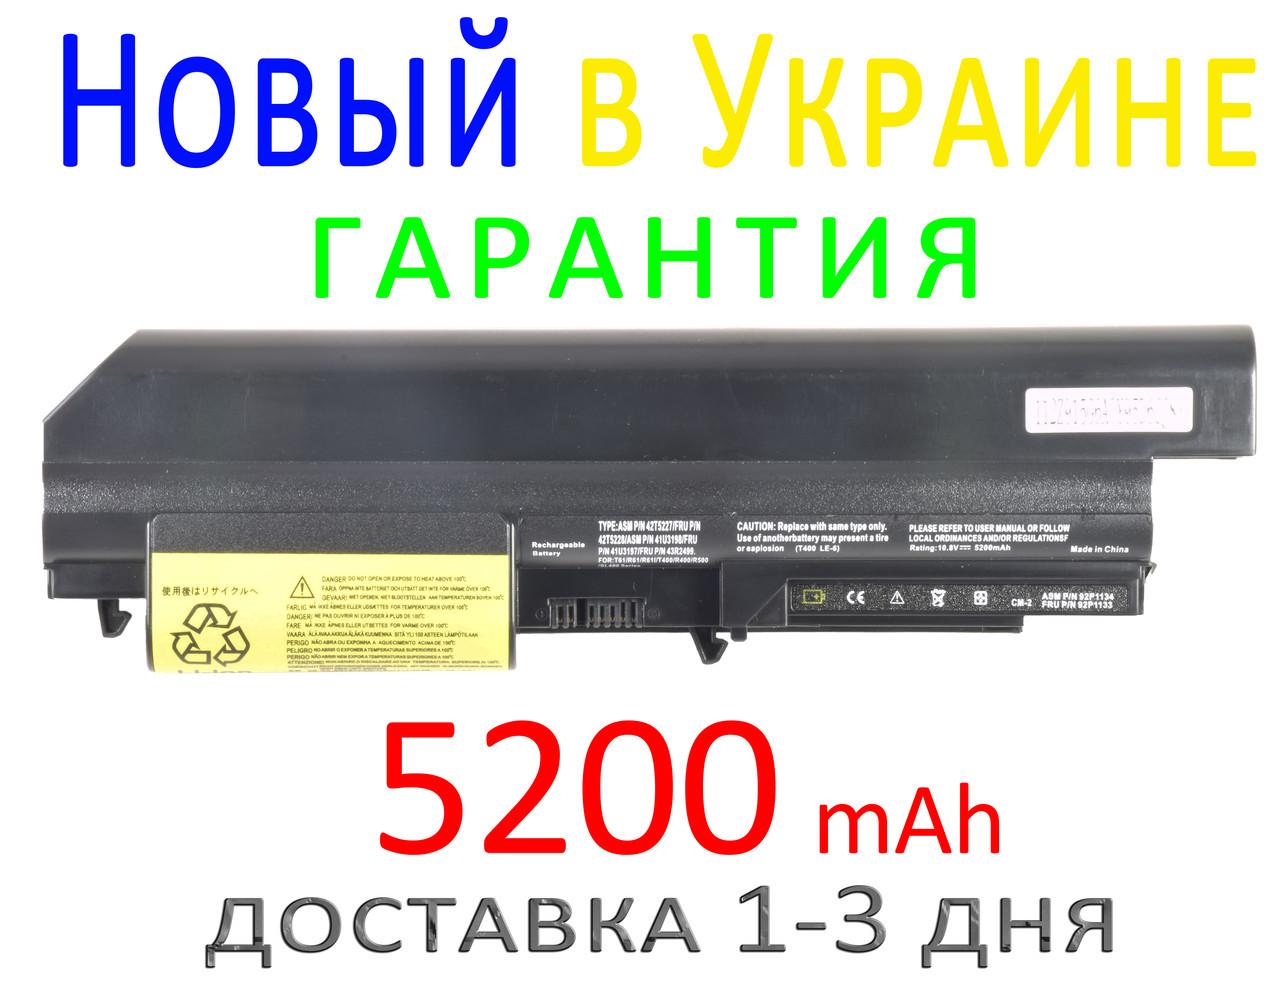 Аккумулятор батарея 42T4573 CL7228B.806 CL7227B.806 iB-A346 iB-A346H TOP-R61i 11-1346